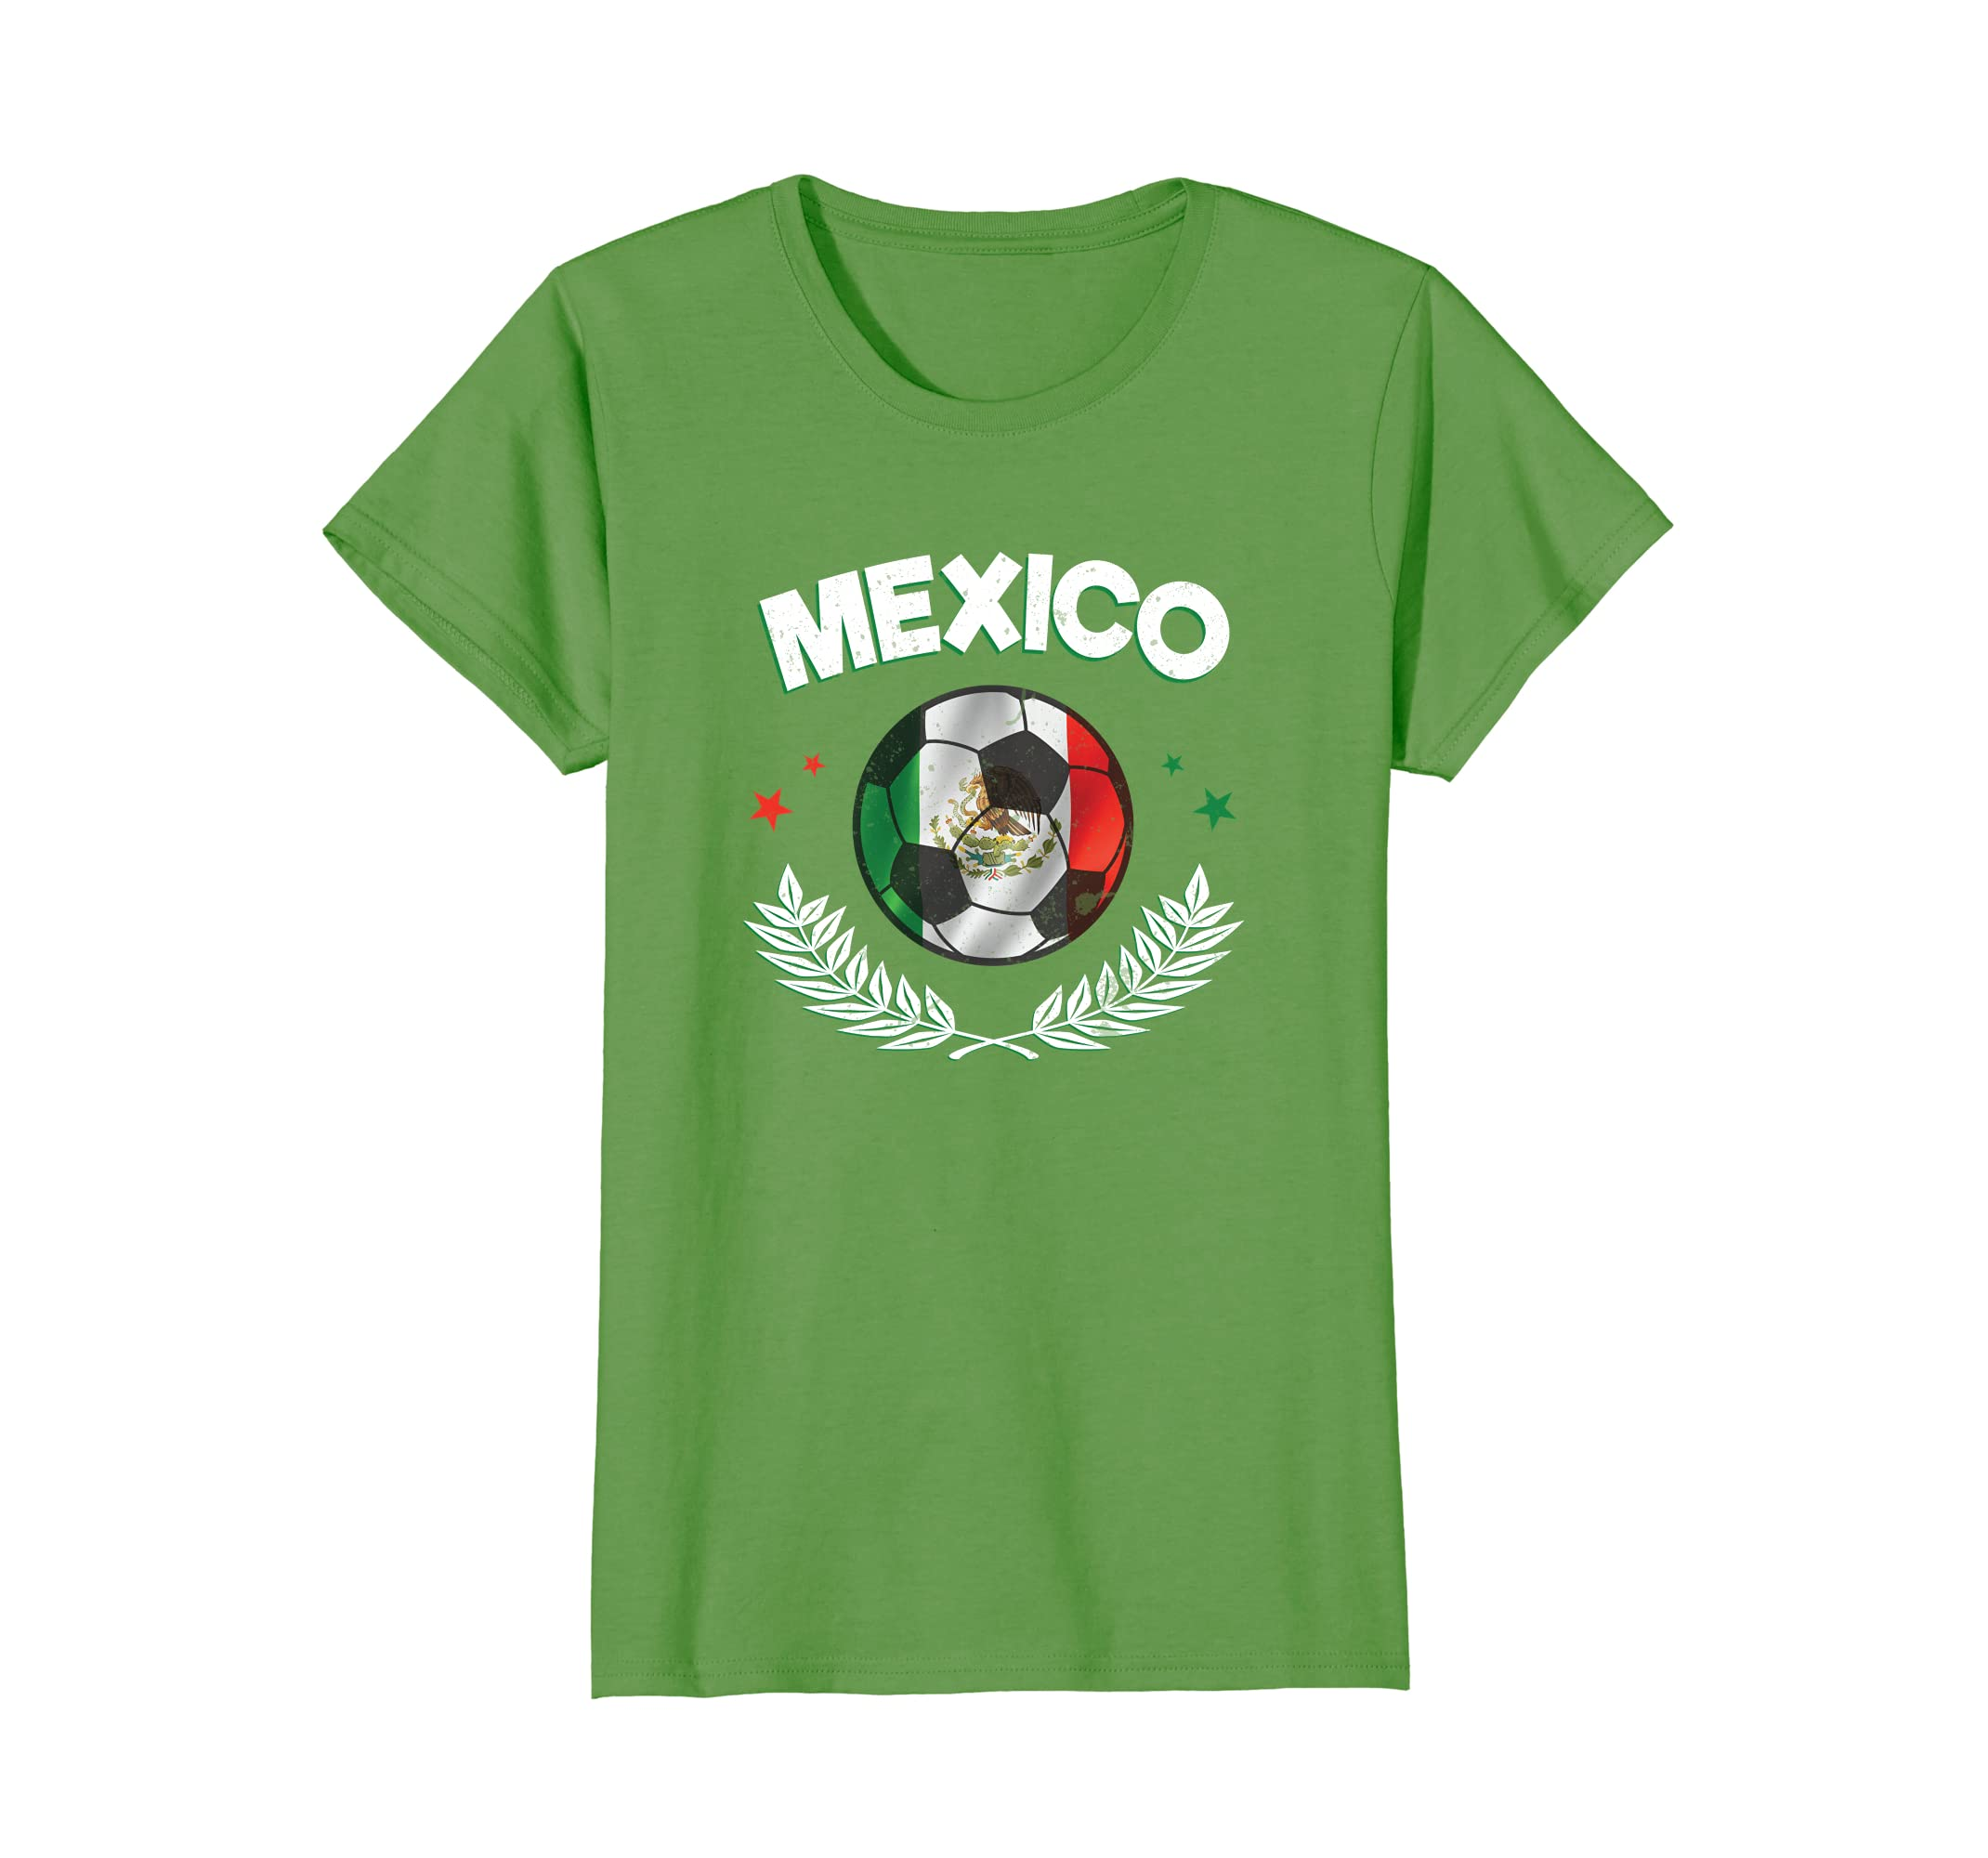 Amazon.com: Seleccion Mexicana Camisa De Futbol Mundial Bandera Mexico: Clothing